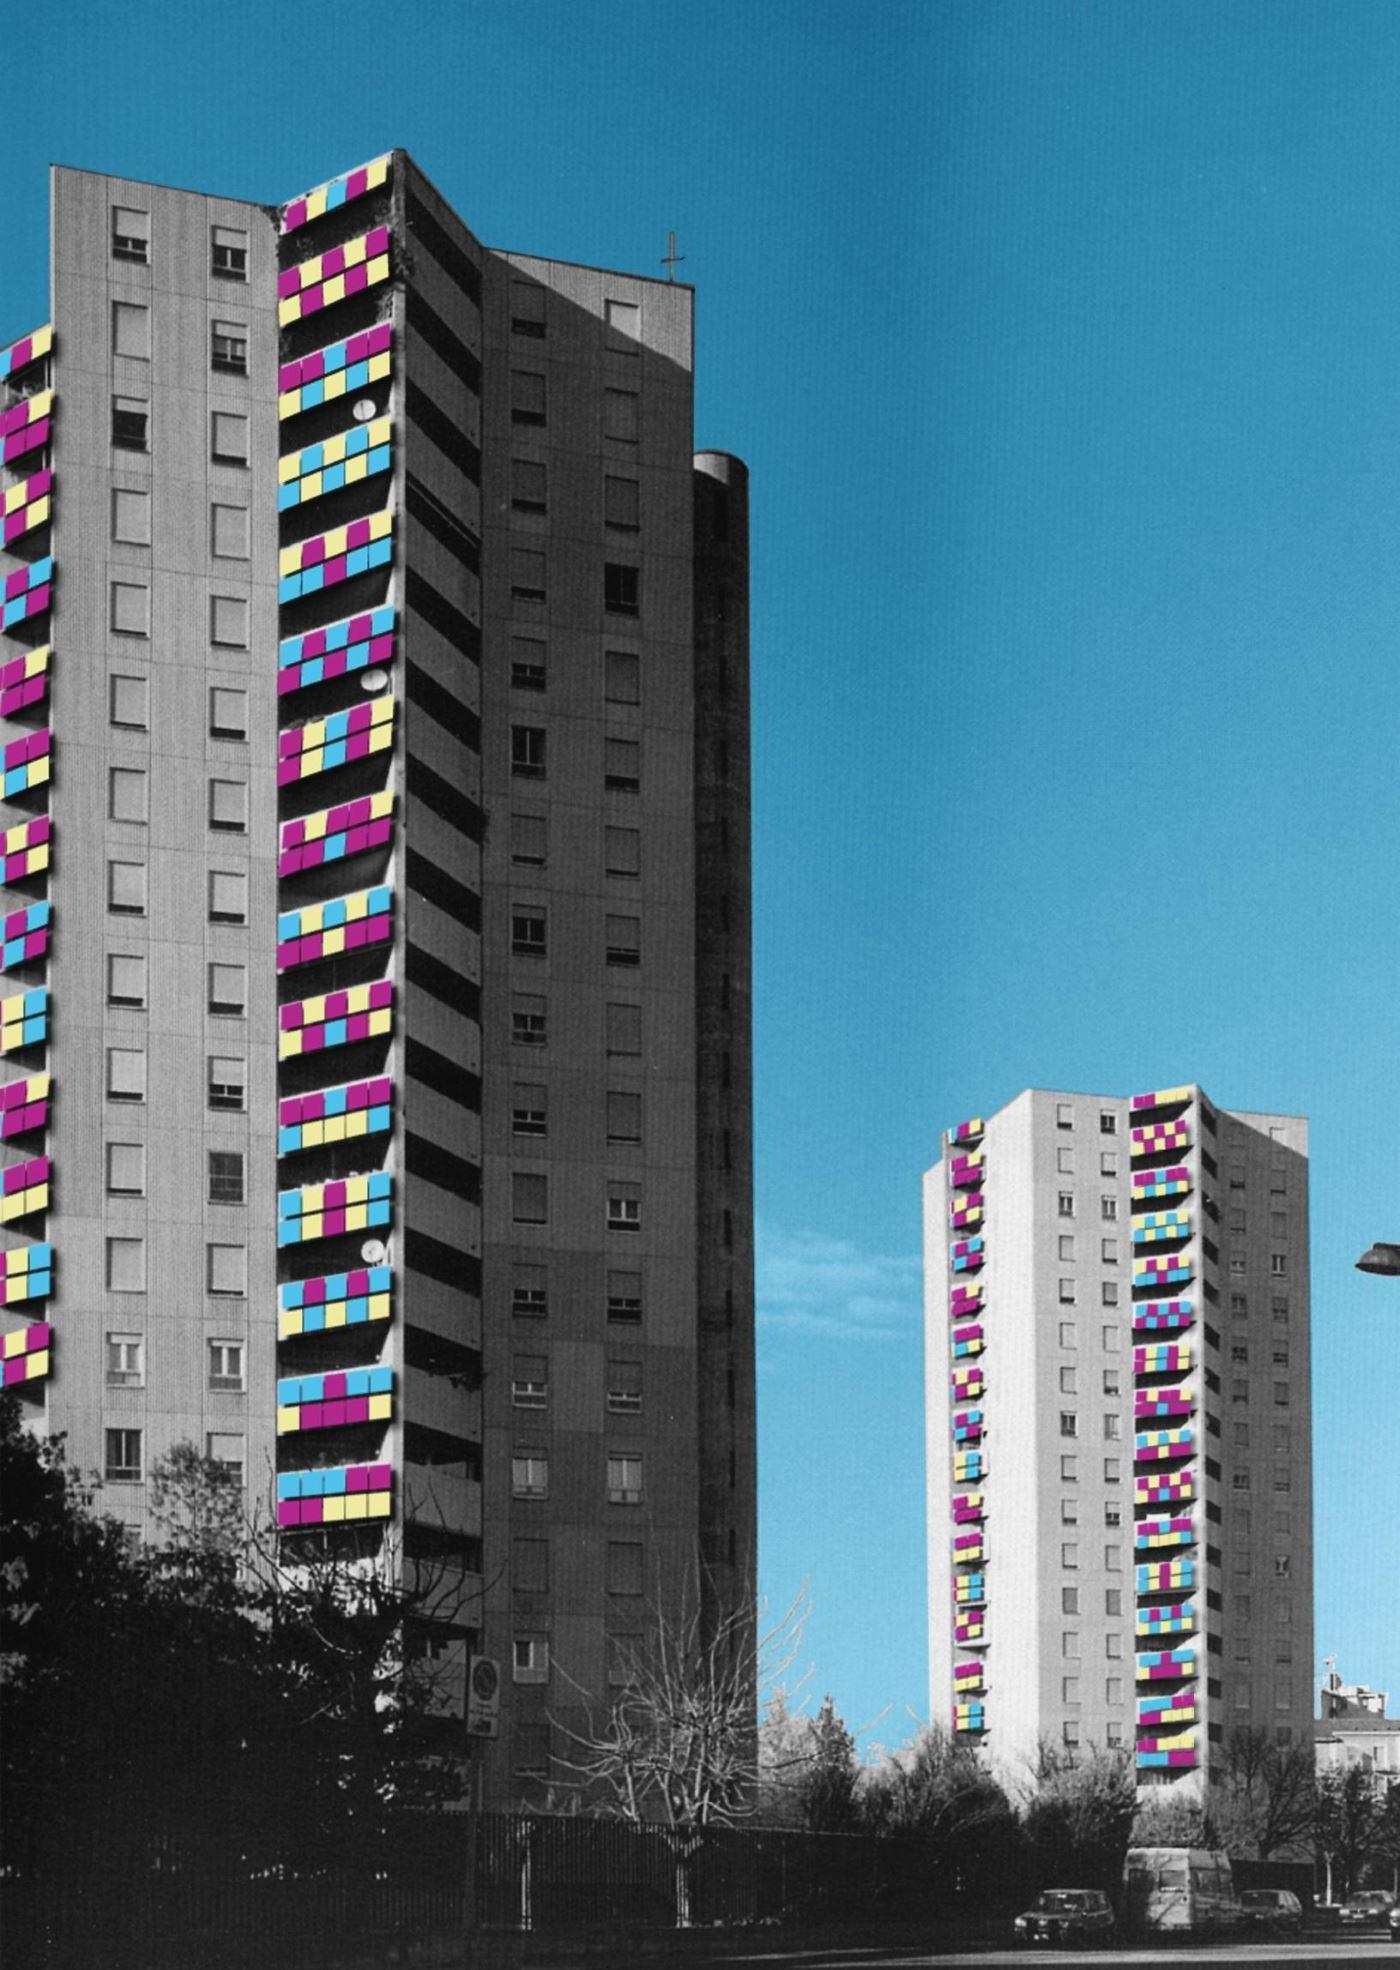 urban skin solar cells - Alessandro Villa architect